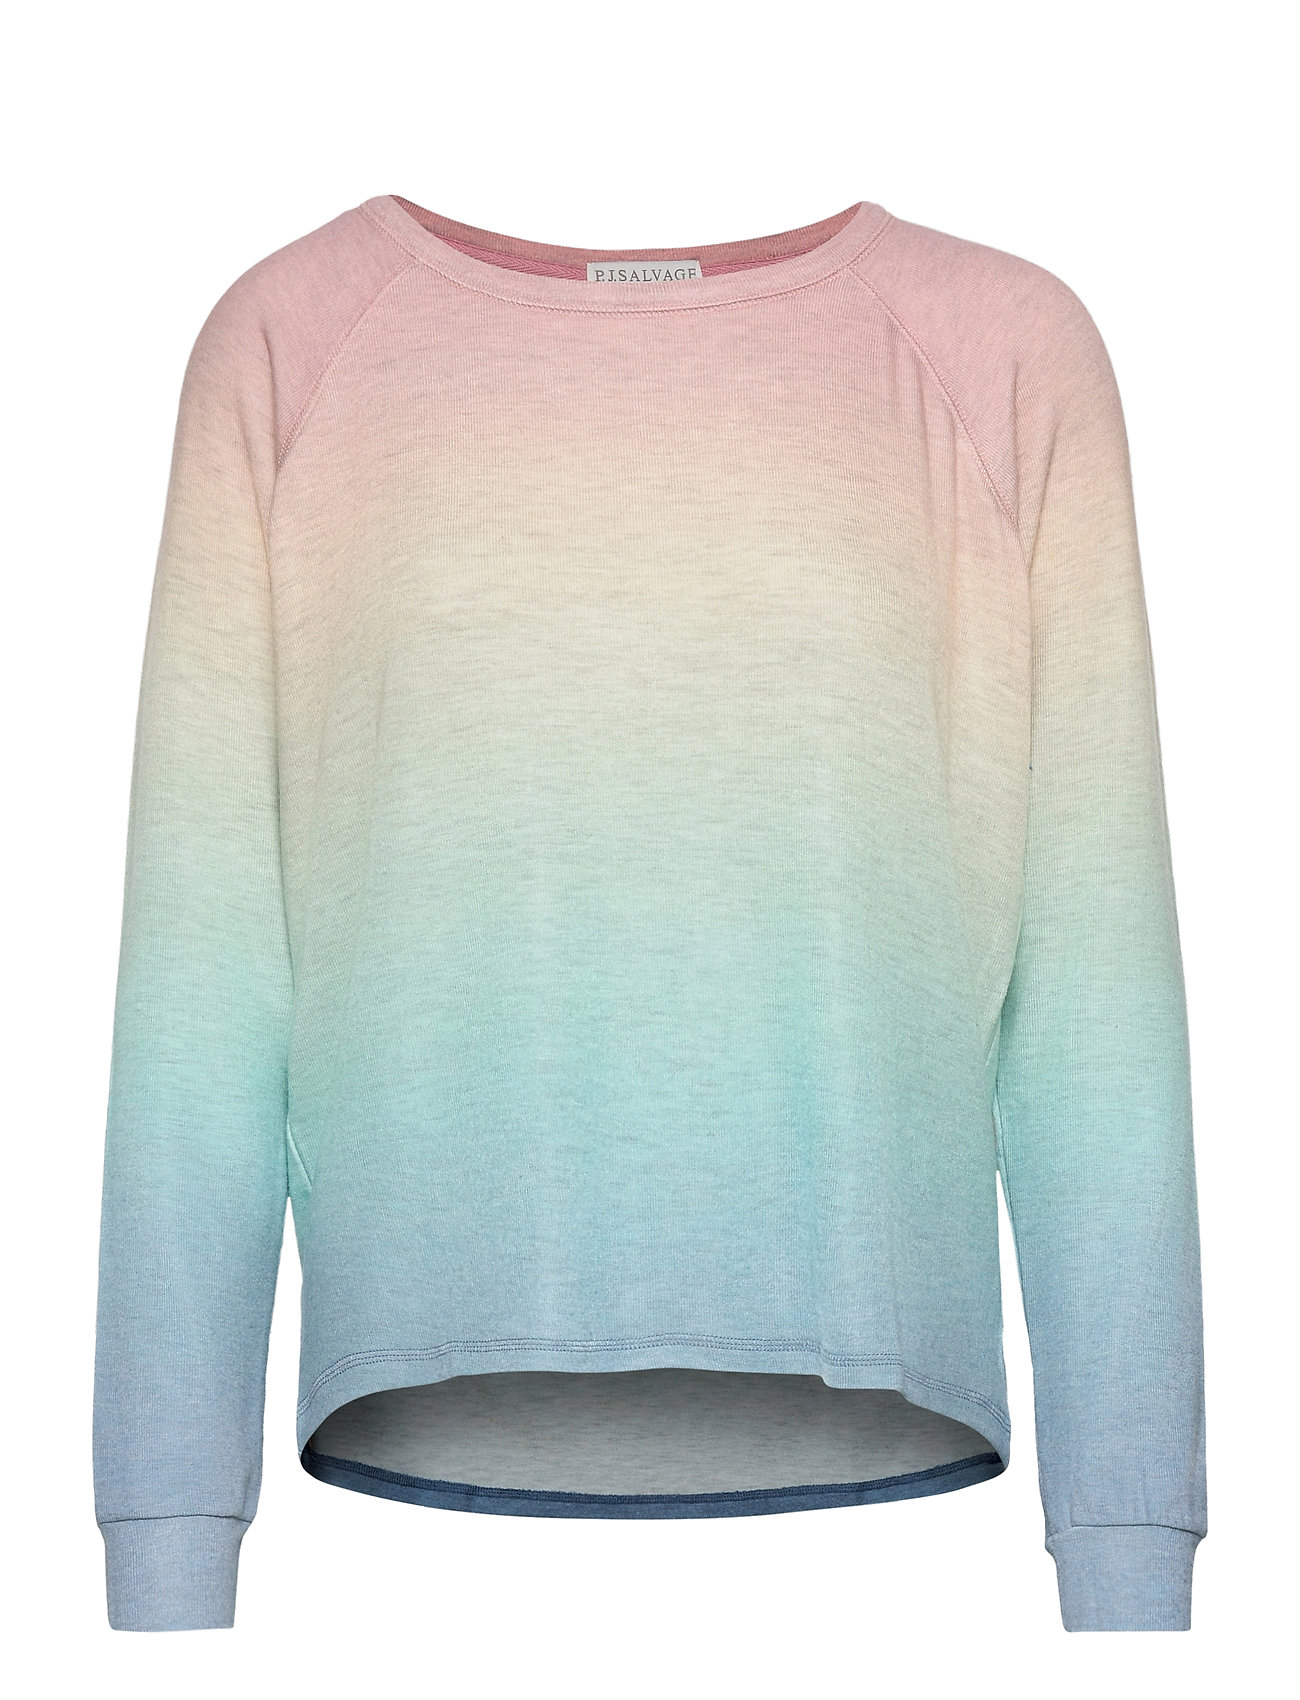 Image of Shirt 1/1 Top Lyserød PJ Salvage (3520091993)